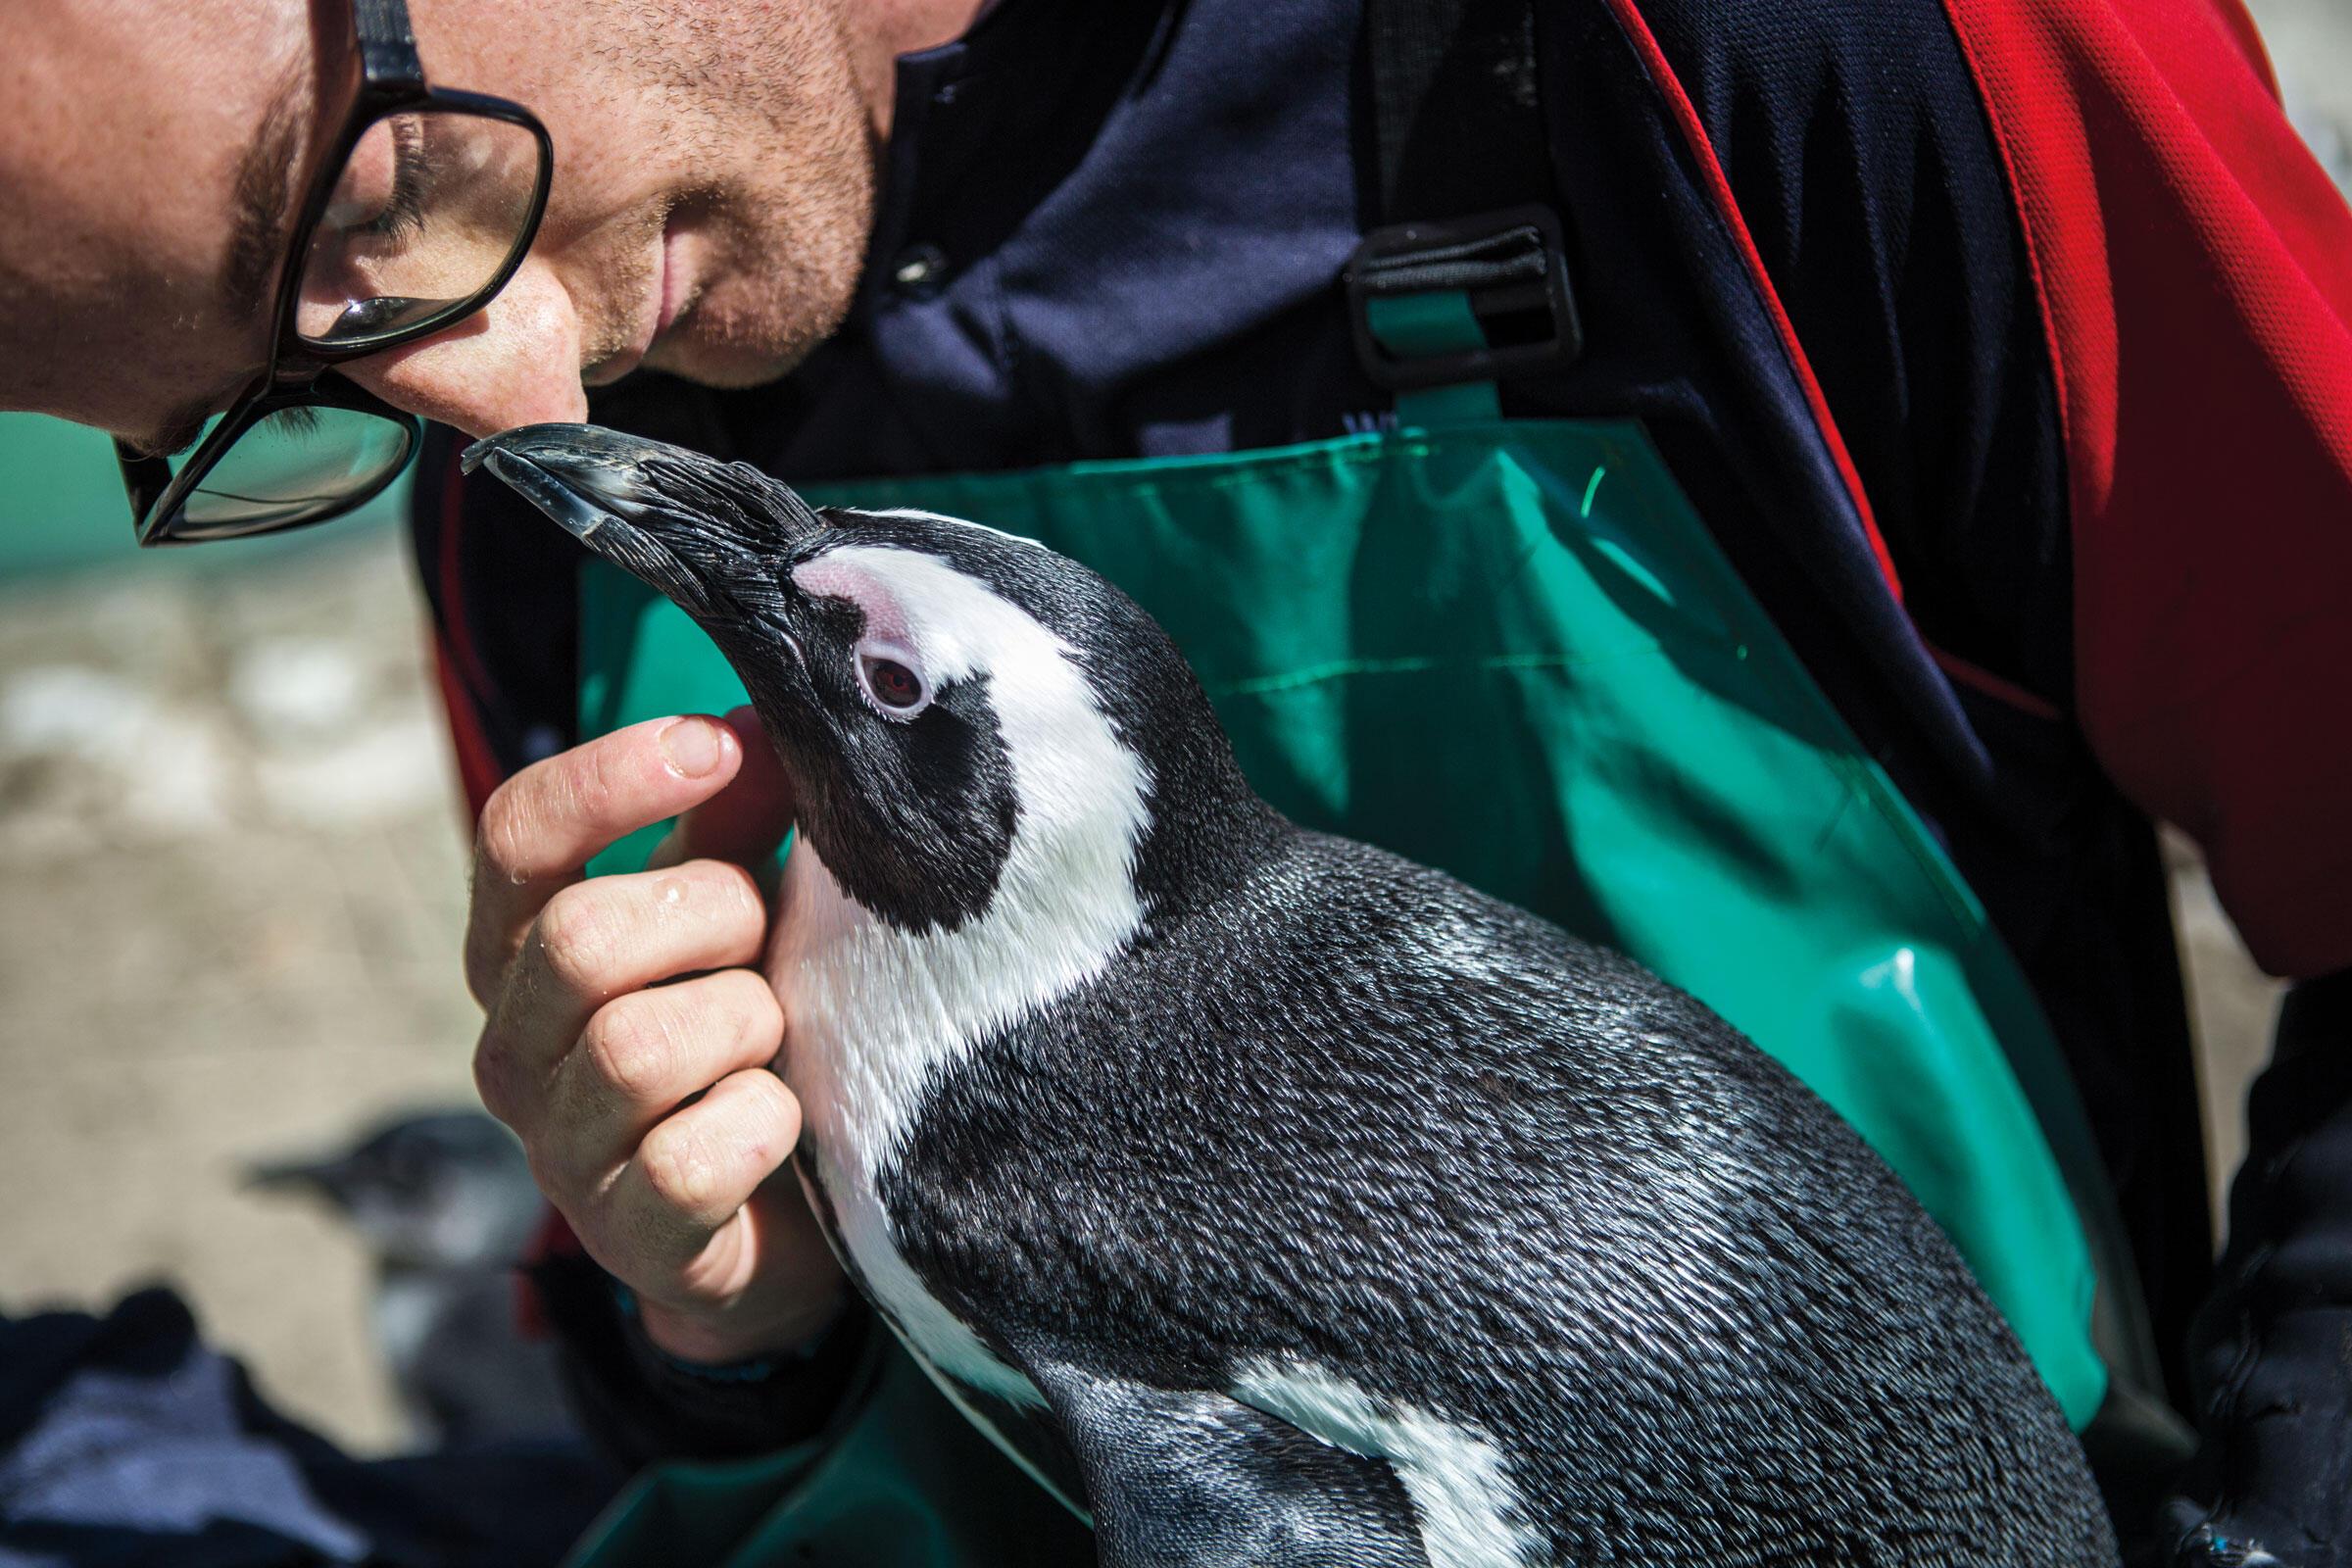 Seabird rehabilitator Peter van der Linde nuzzles a long-term resident named Skipper. Alexia Webster